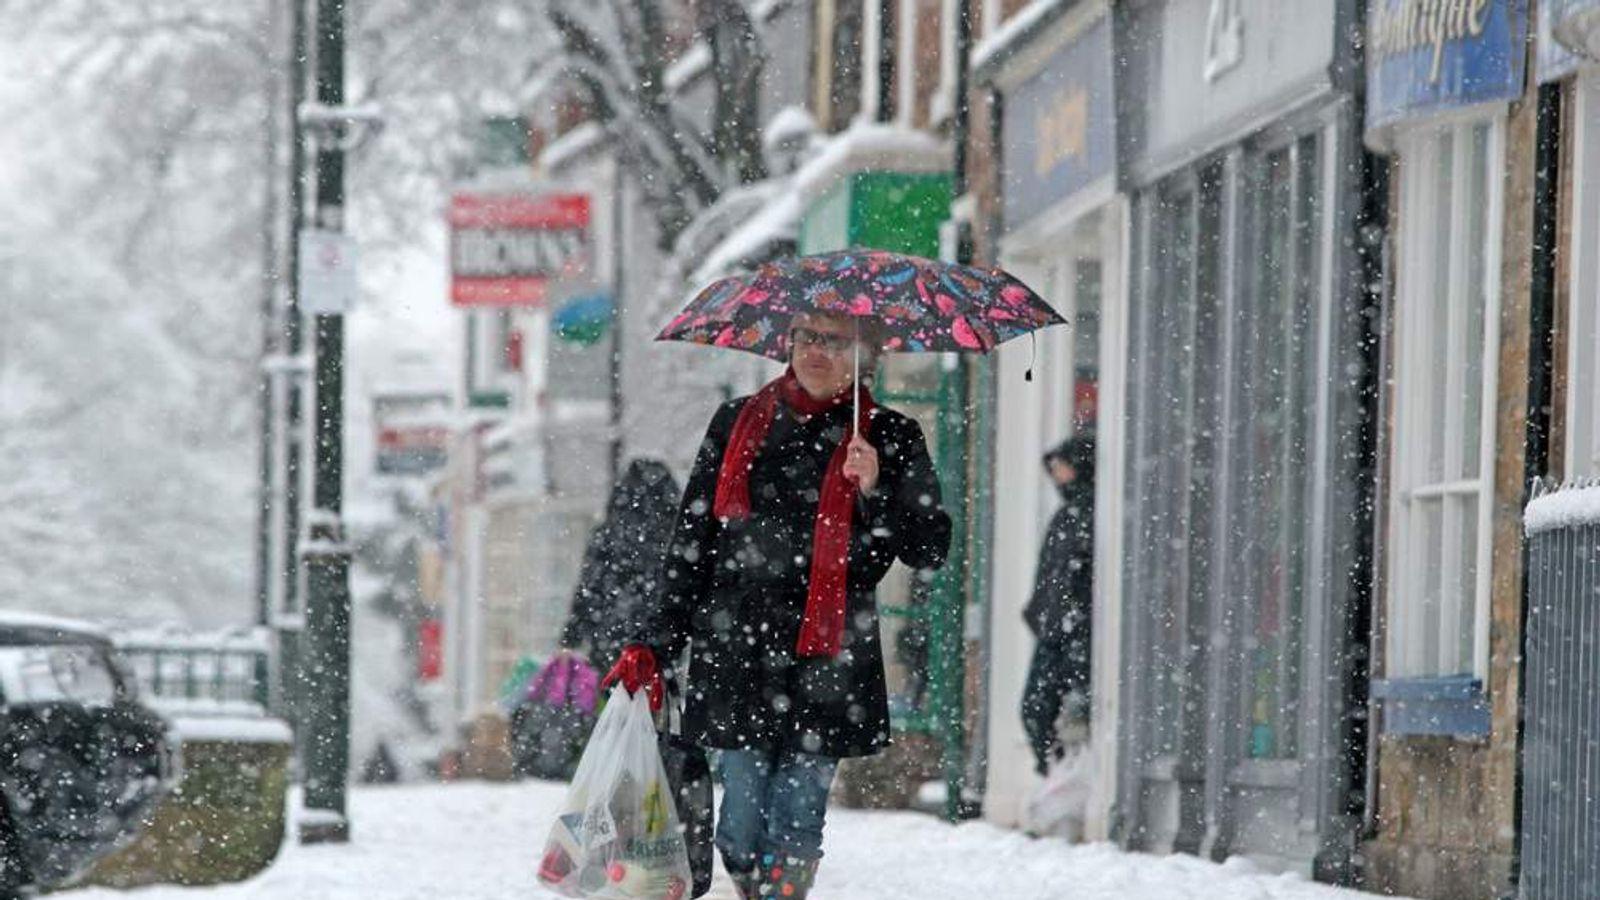 A shopper in snow